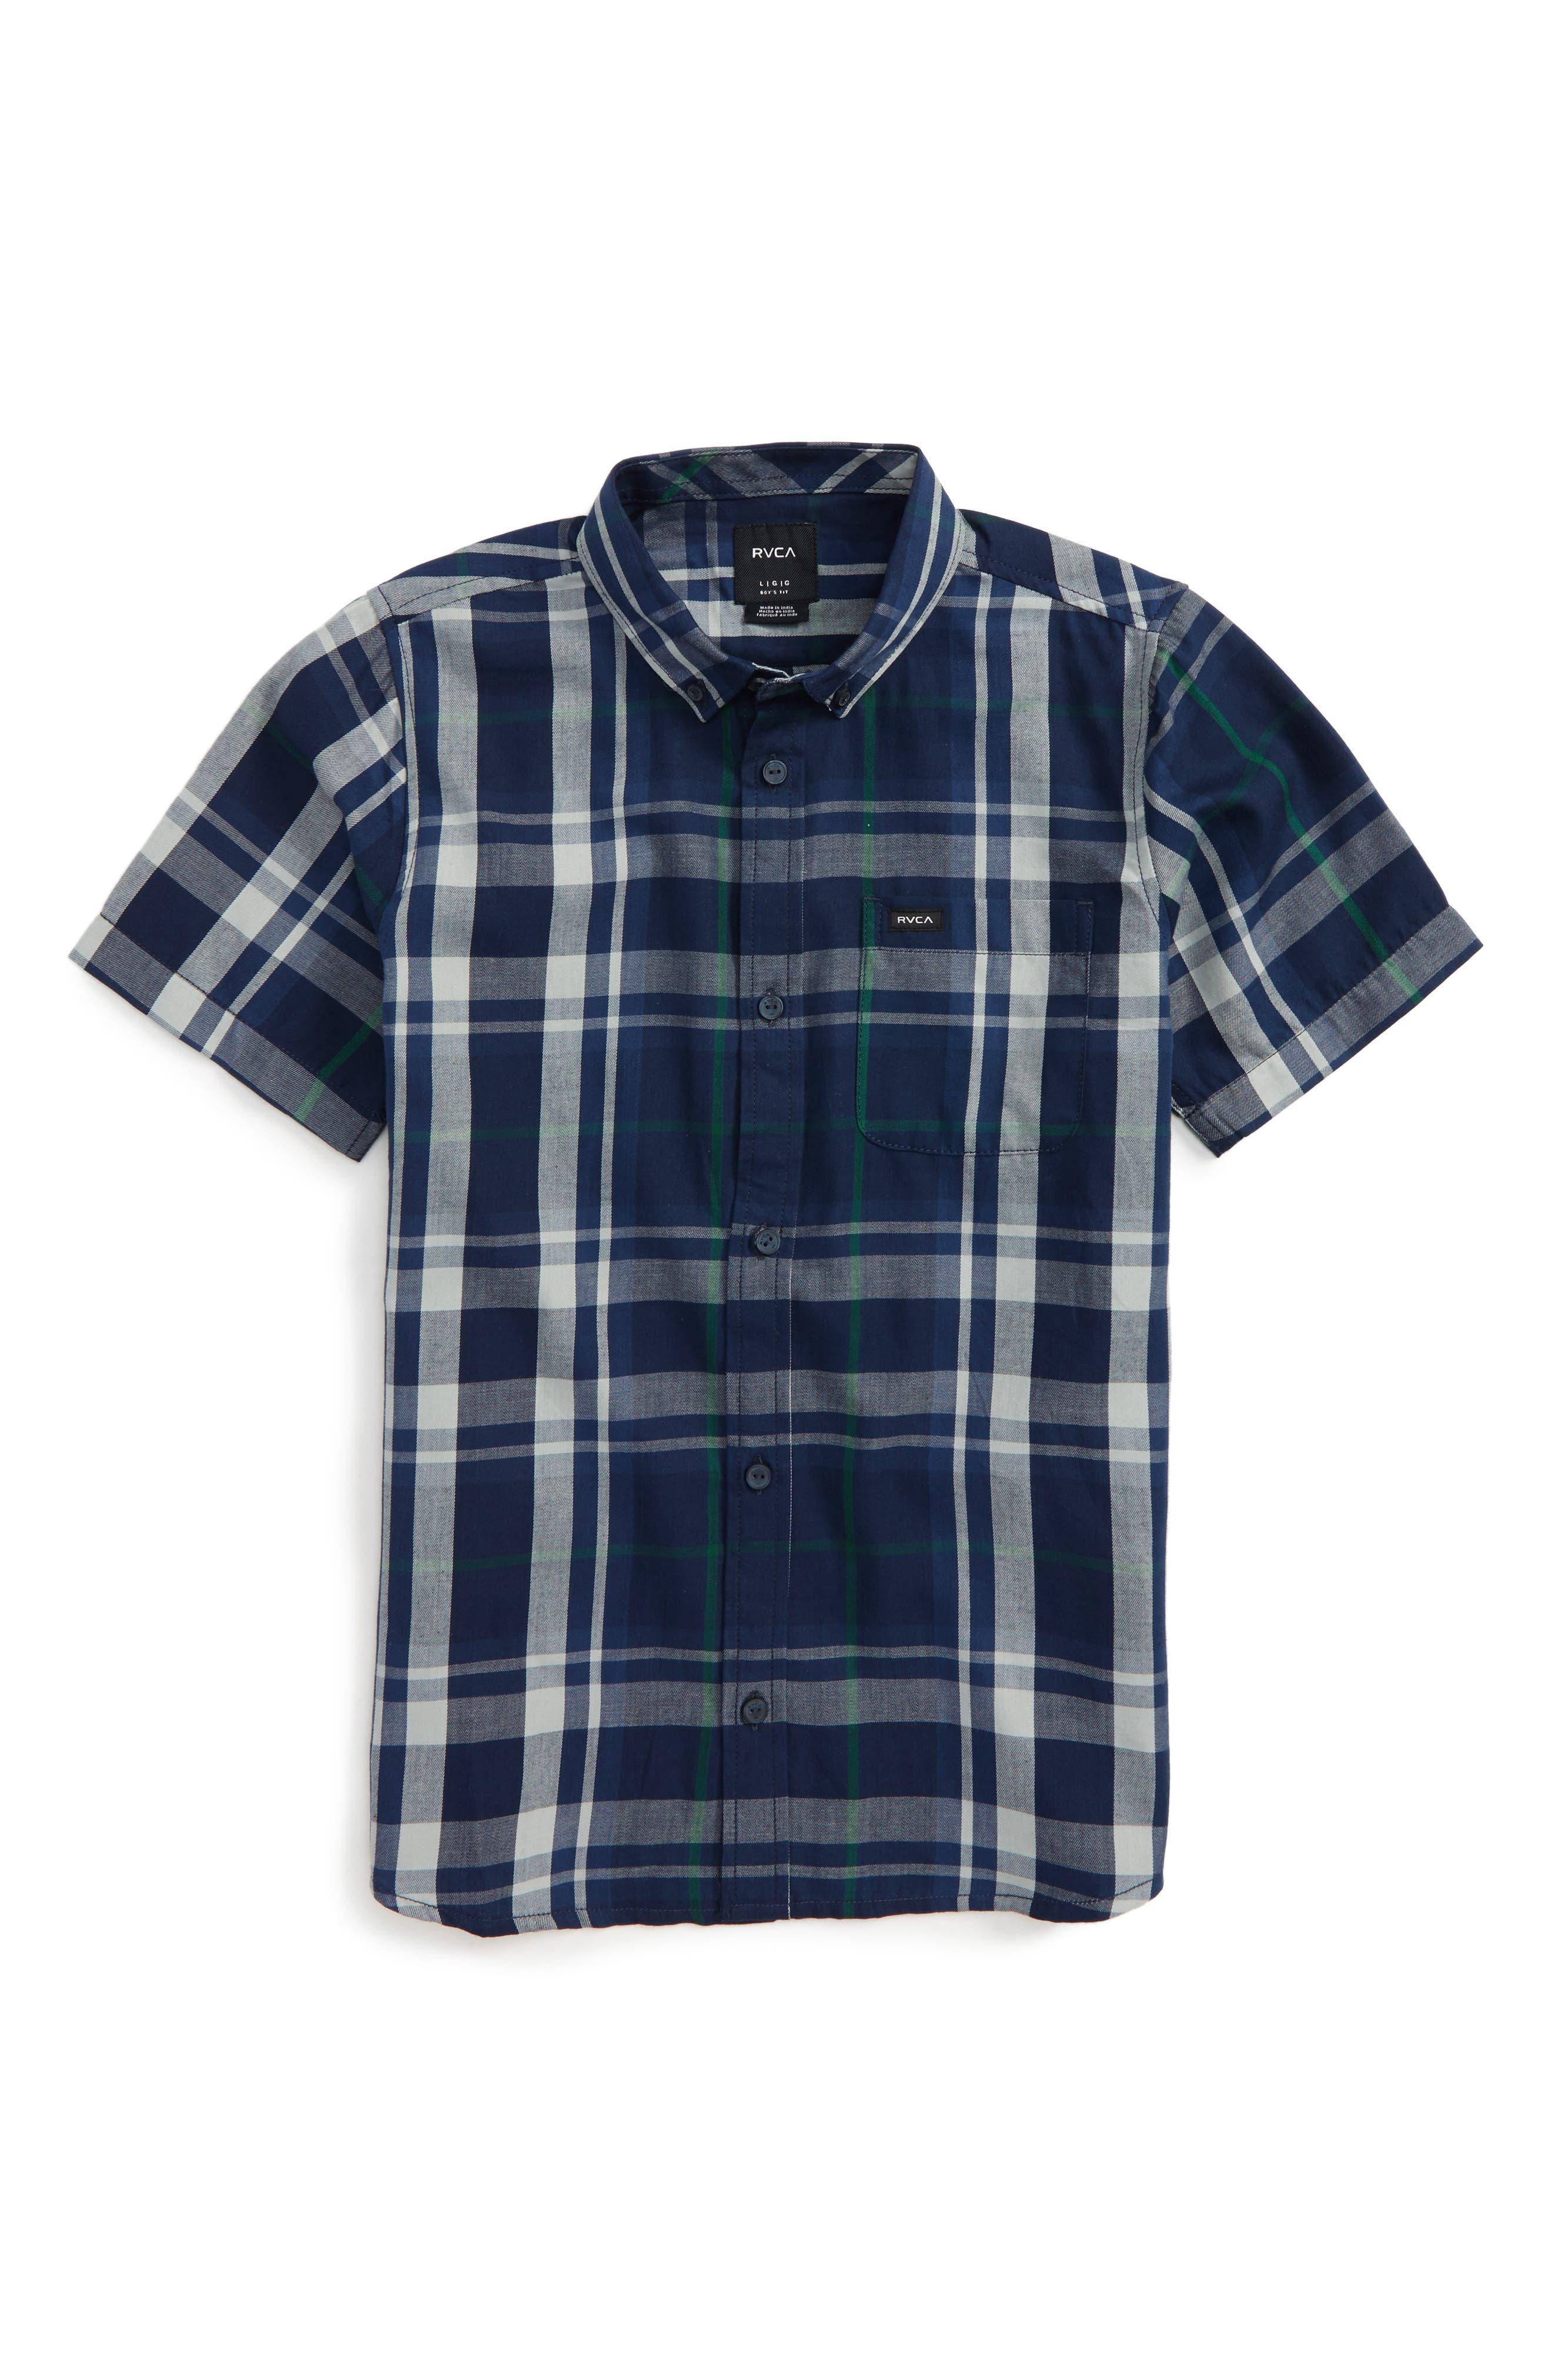 Alternate Image 1 Selected - RVCA Plaid Woven Shirt (Big Boys)